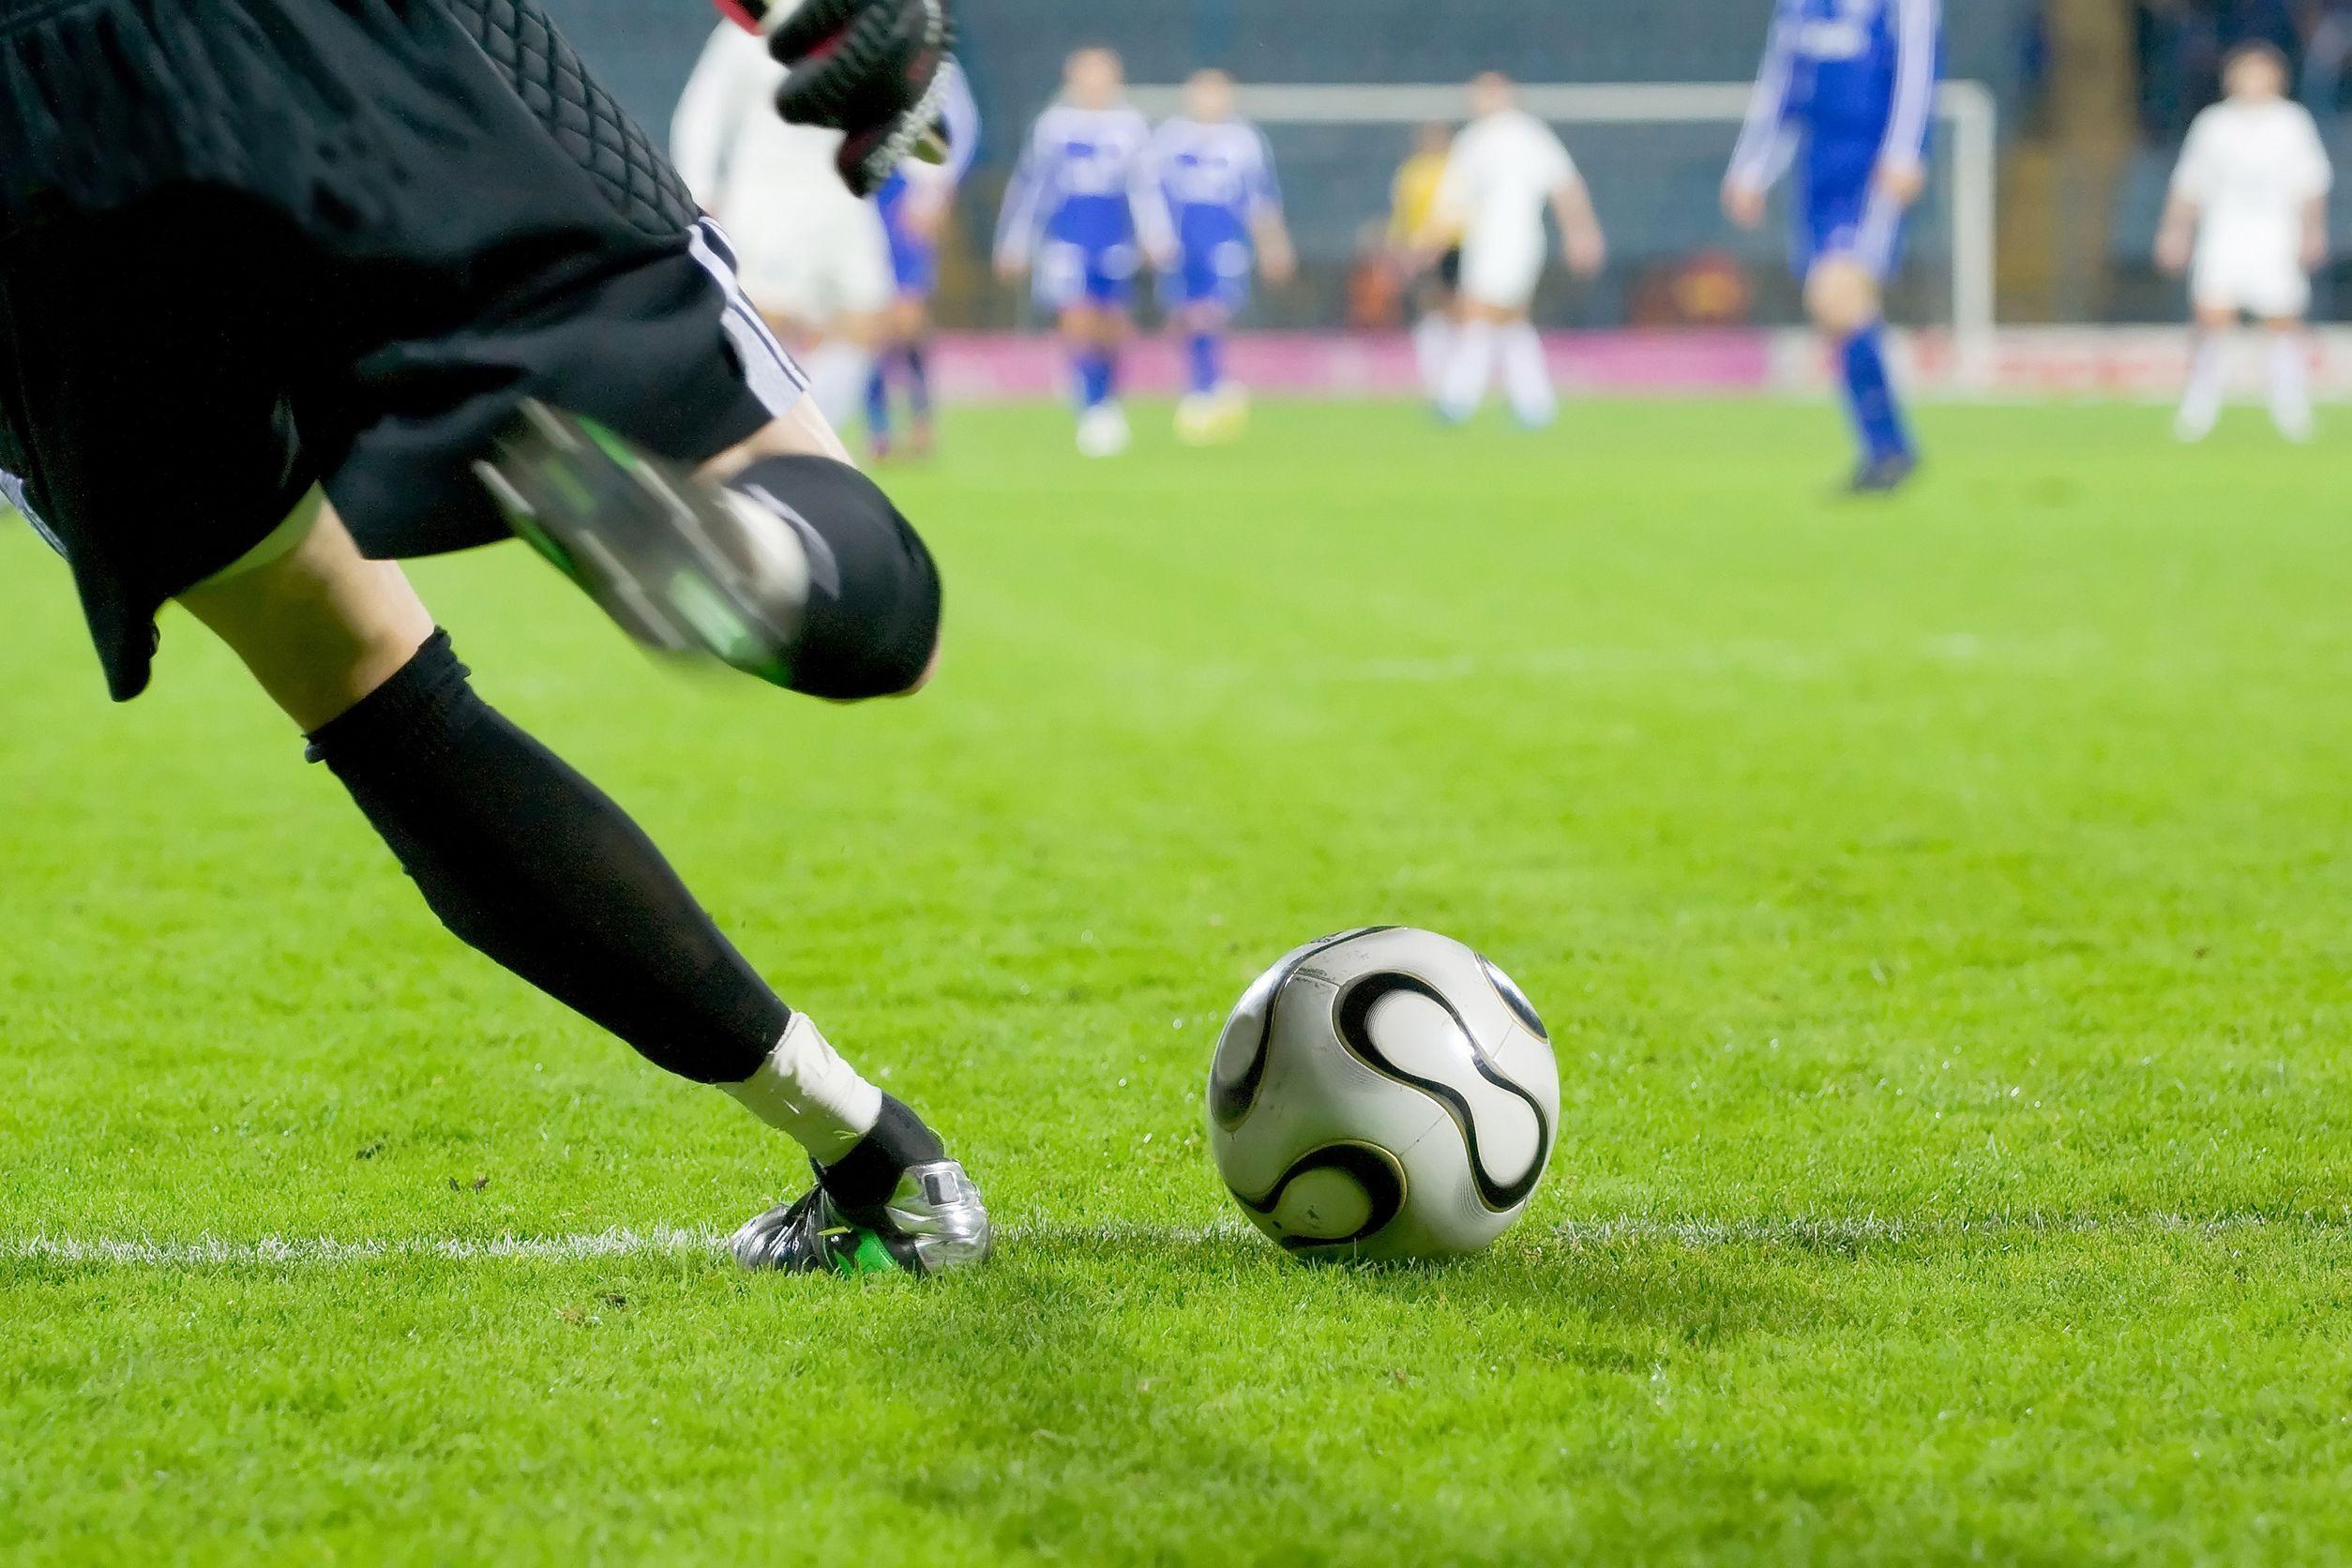 15360935 – soccer or football goalkeeper kick the ball